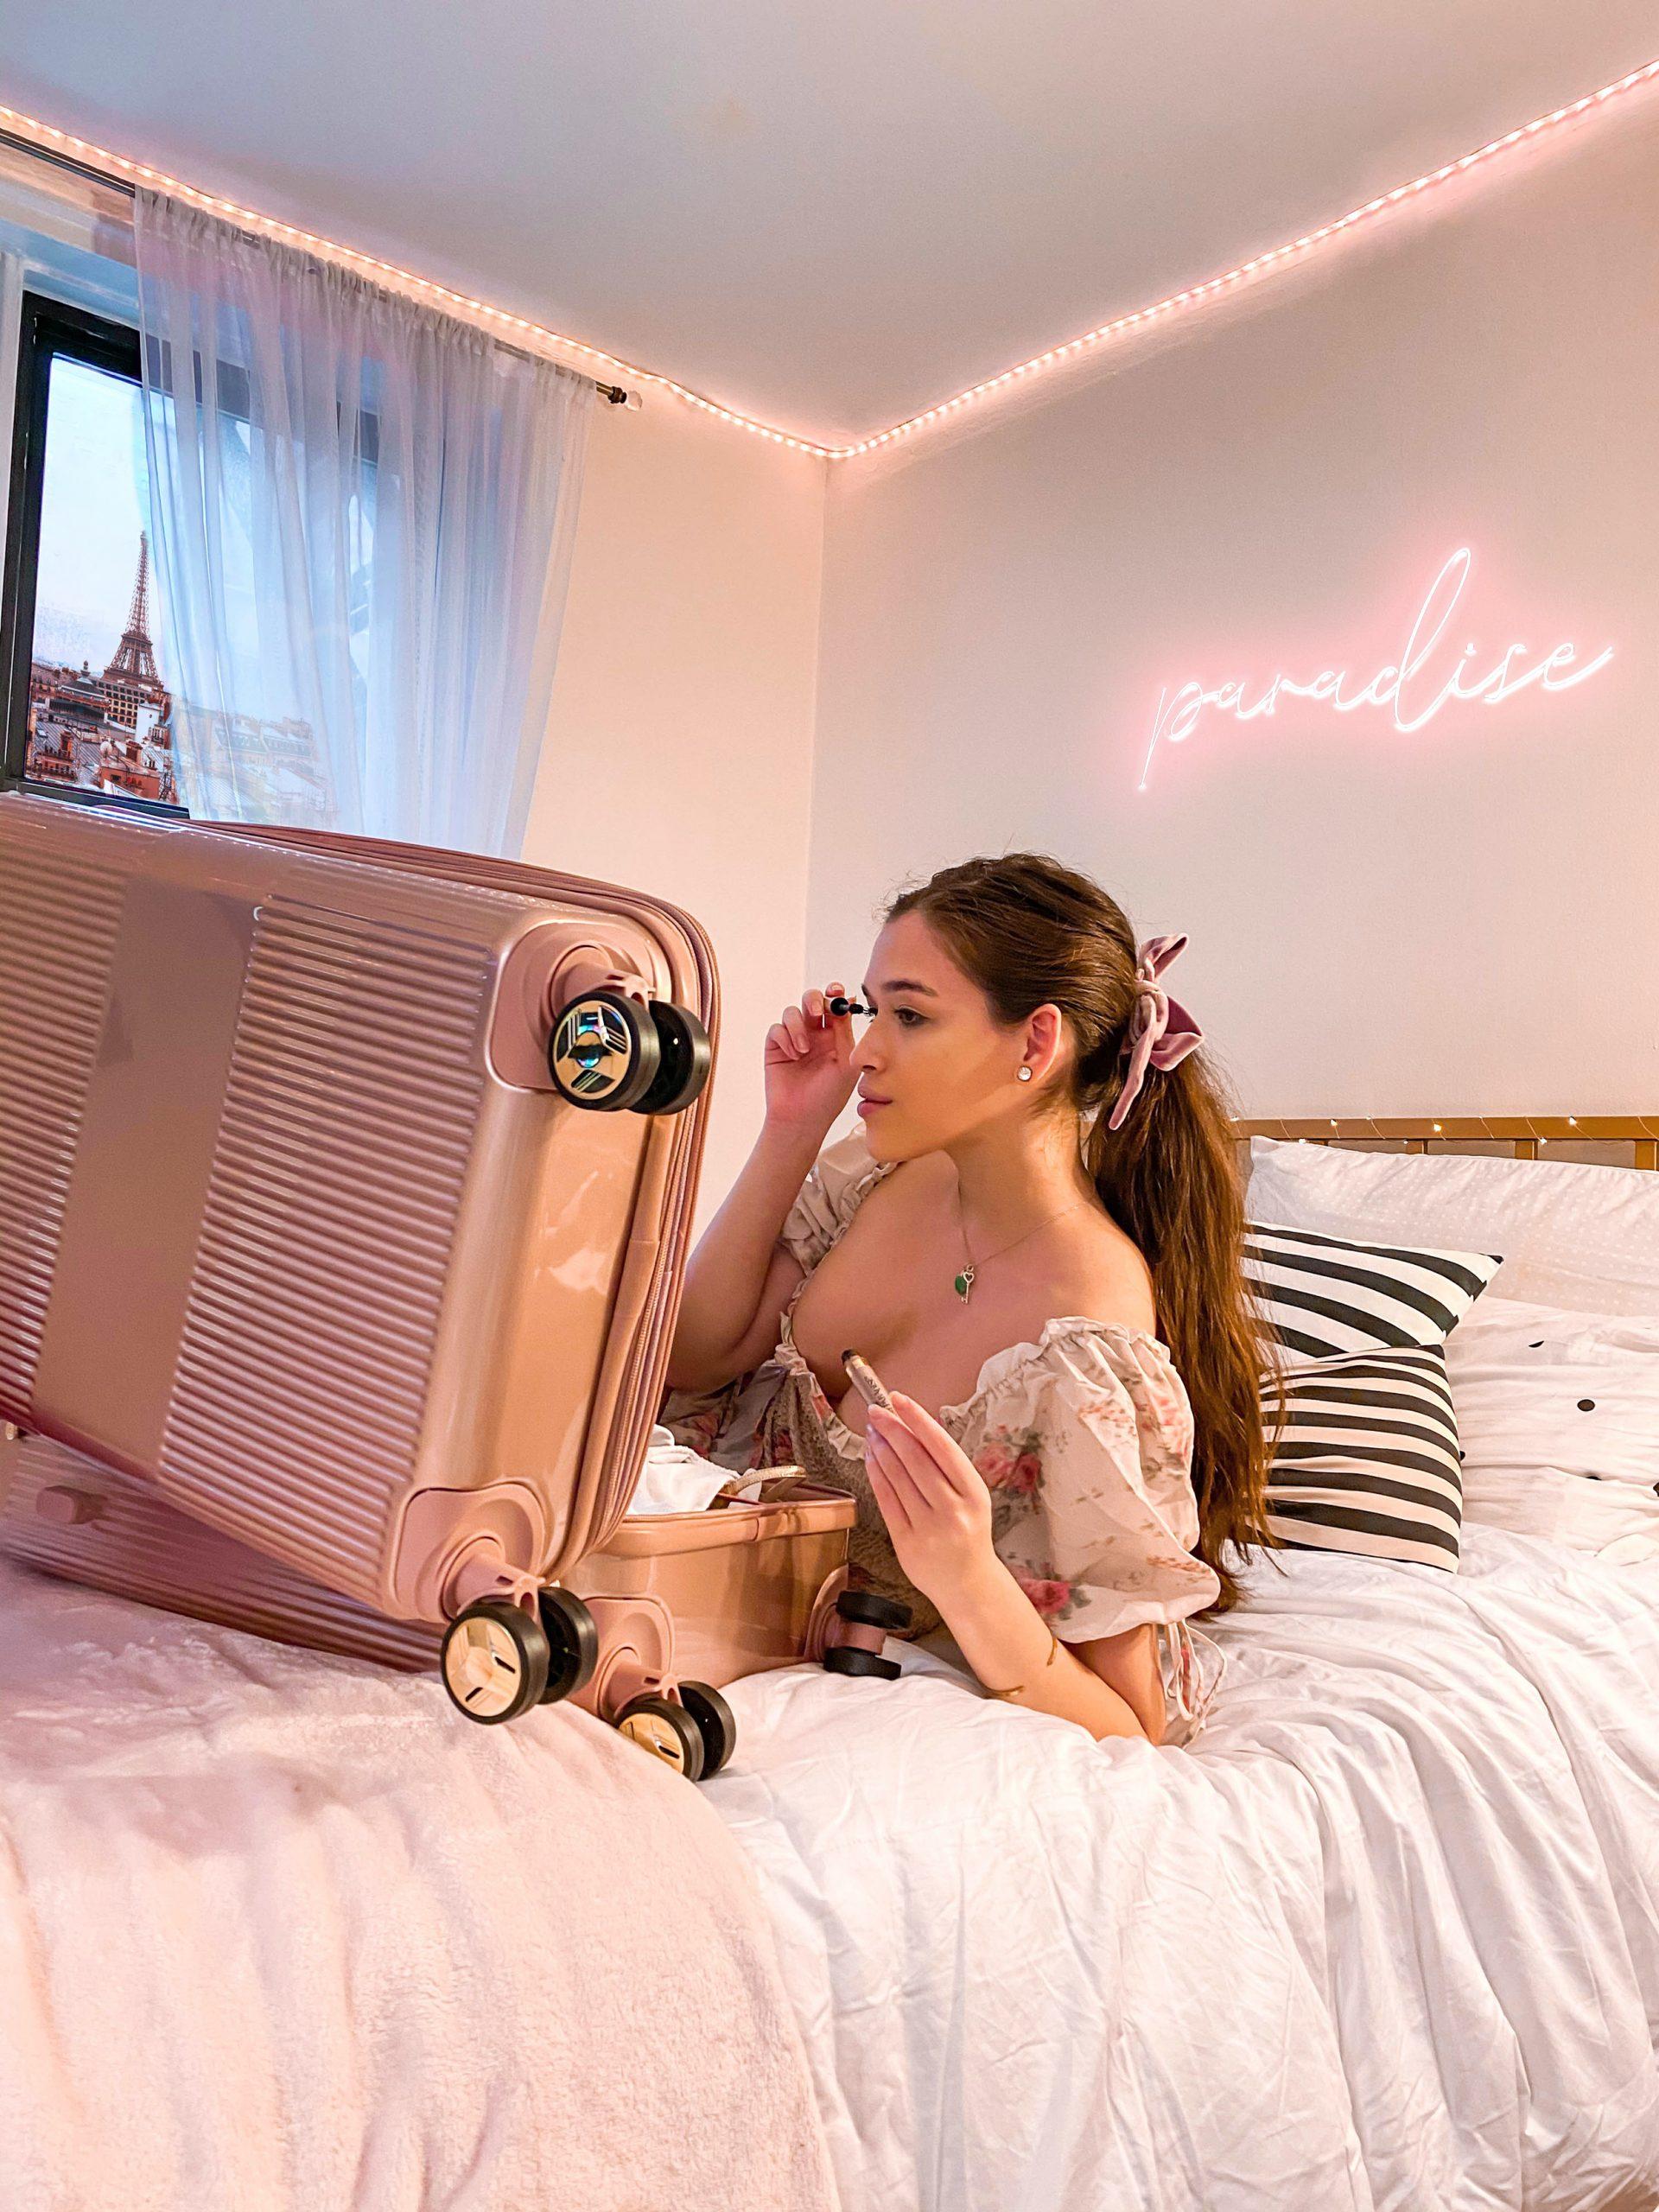 l'oreal lash paradise mascara carry on luggage walmart summer beauty profuct eva phan eva darling travel